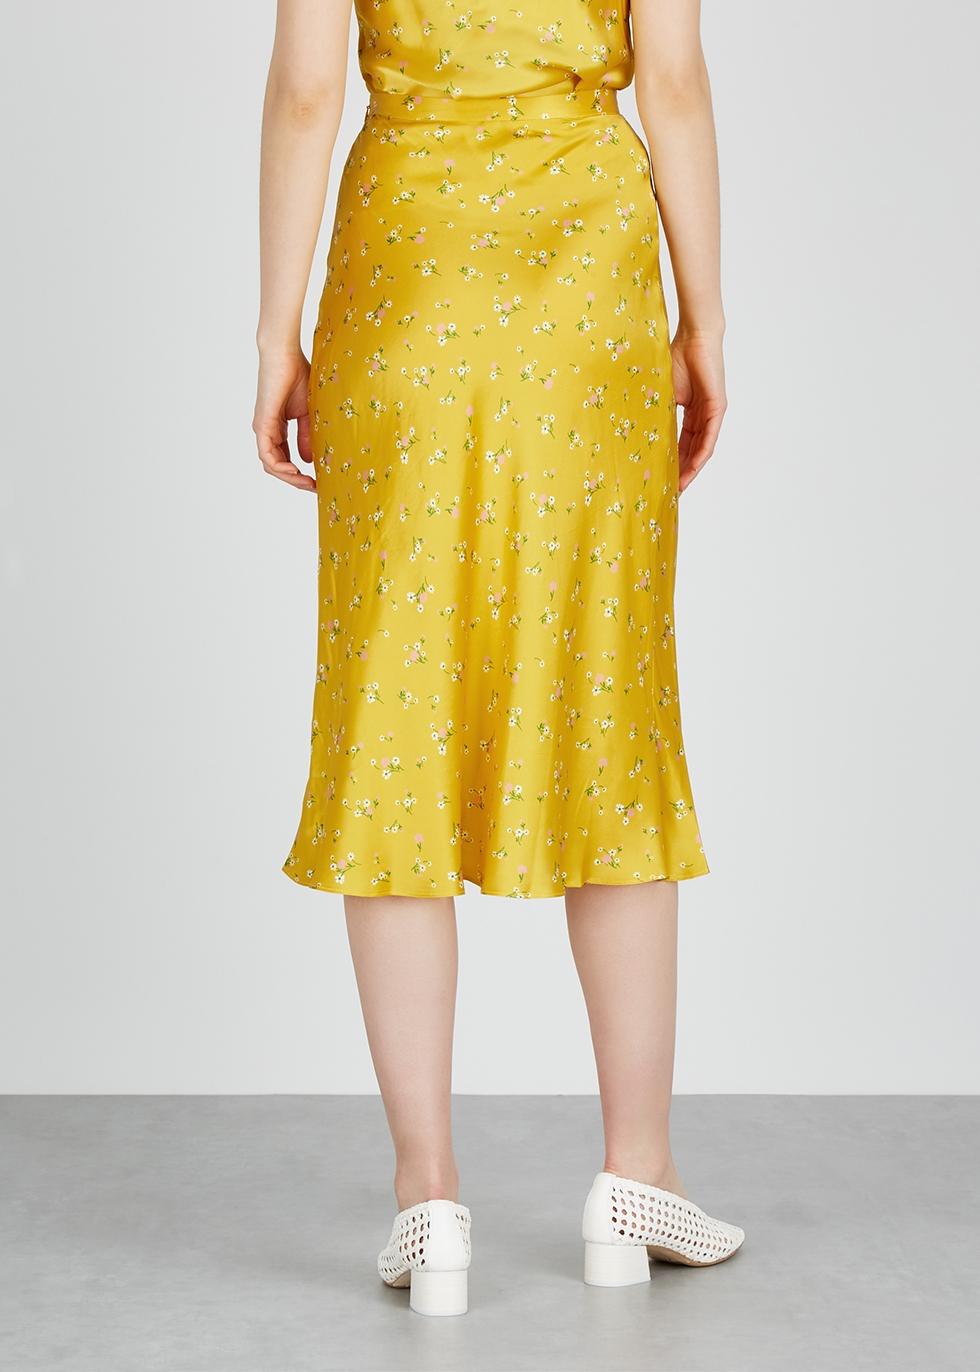 Only In Paris yellow silk skirt - Bec & Bridge